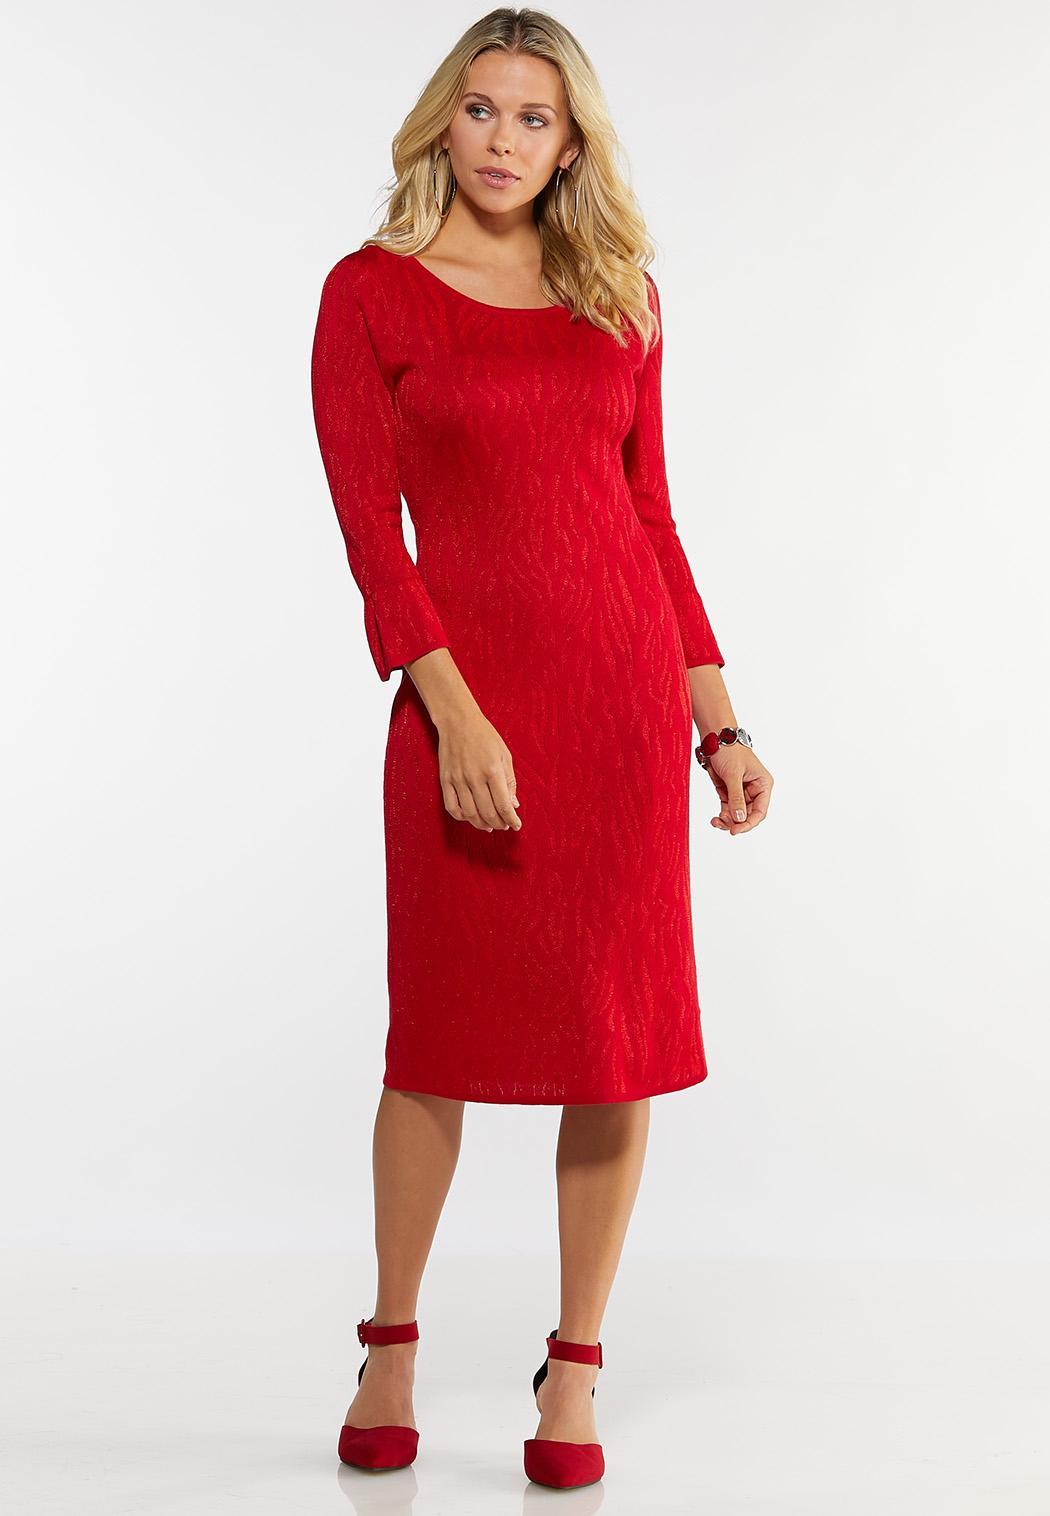 Plus Size Red Zebra Print Sweater Dress Plus Sizes Cato Fashions